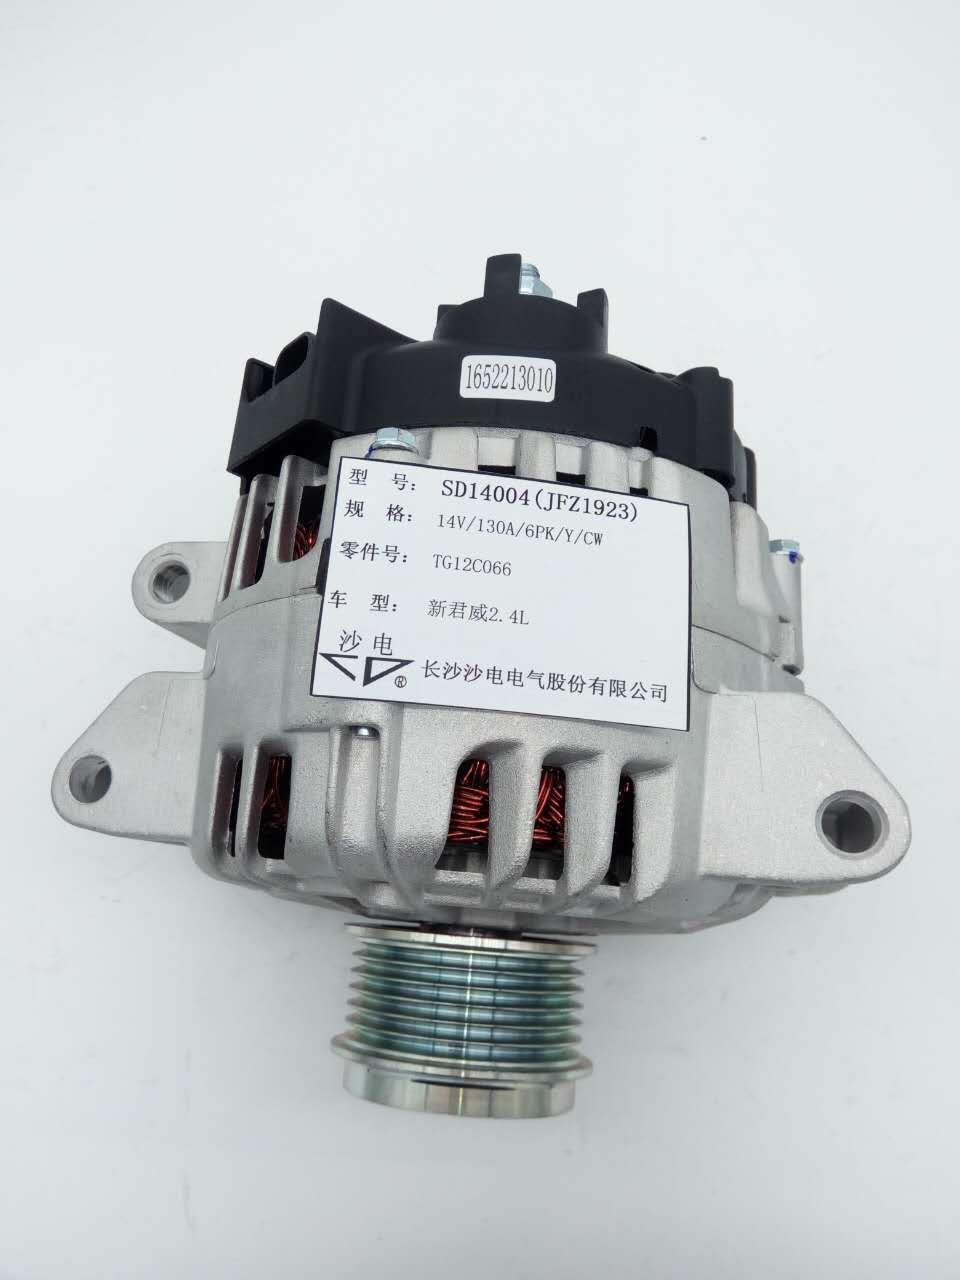 Buick alternator TG12C066 CVS082548 440617